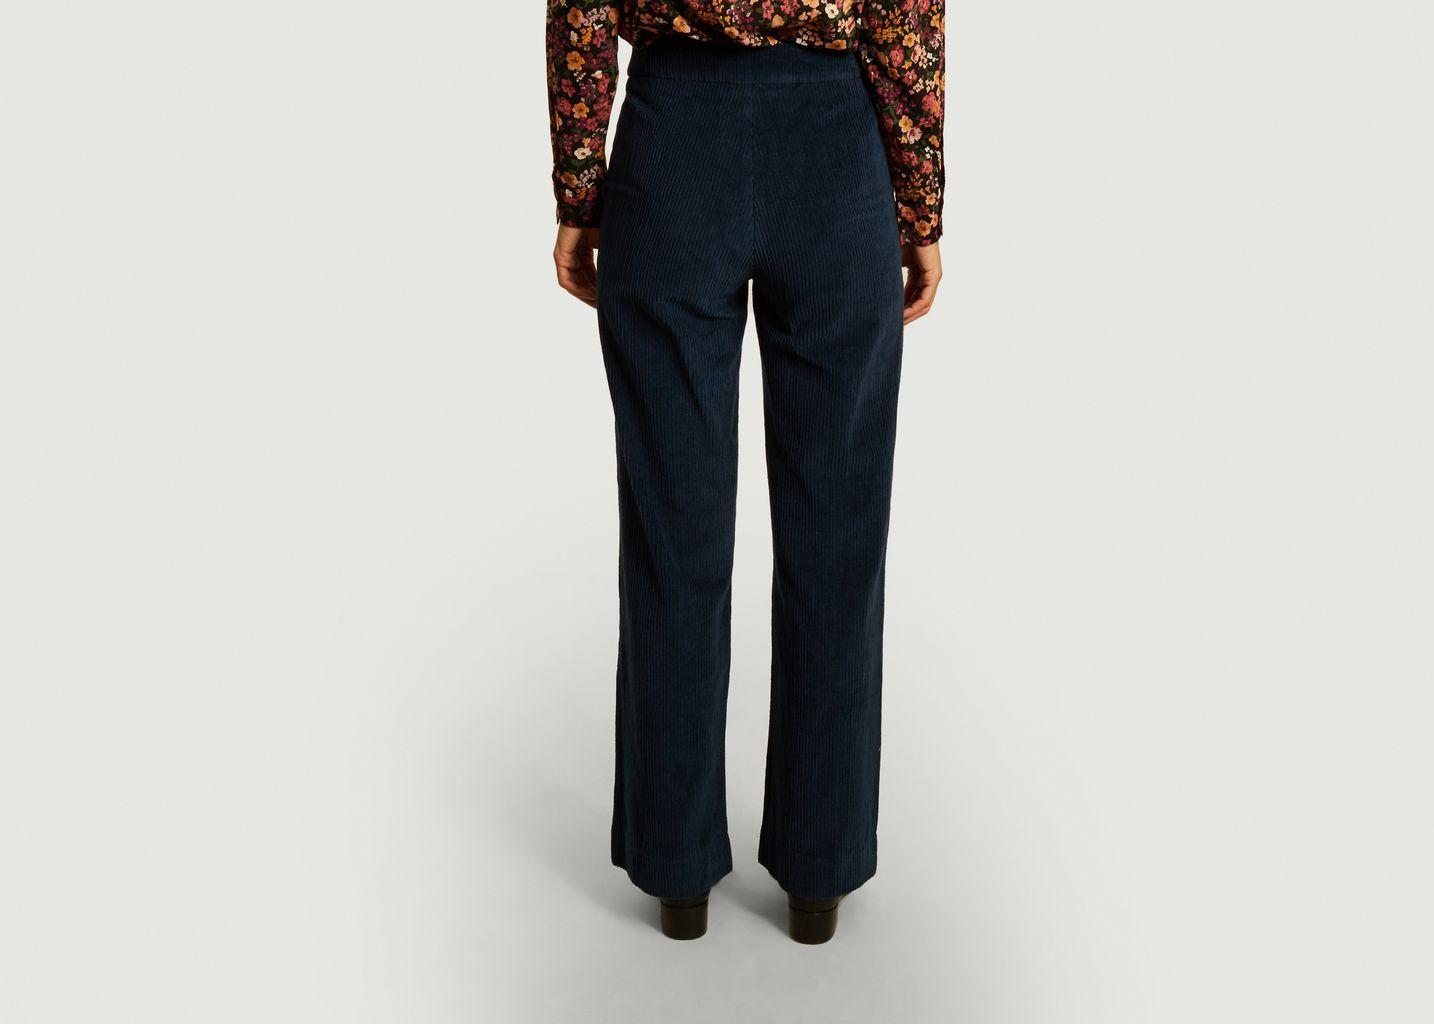 Pantalon en velours côtelé Willy - Jolie Jolie